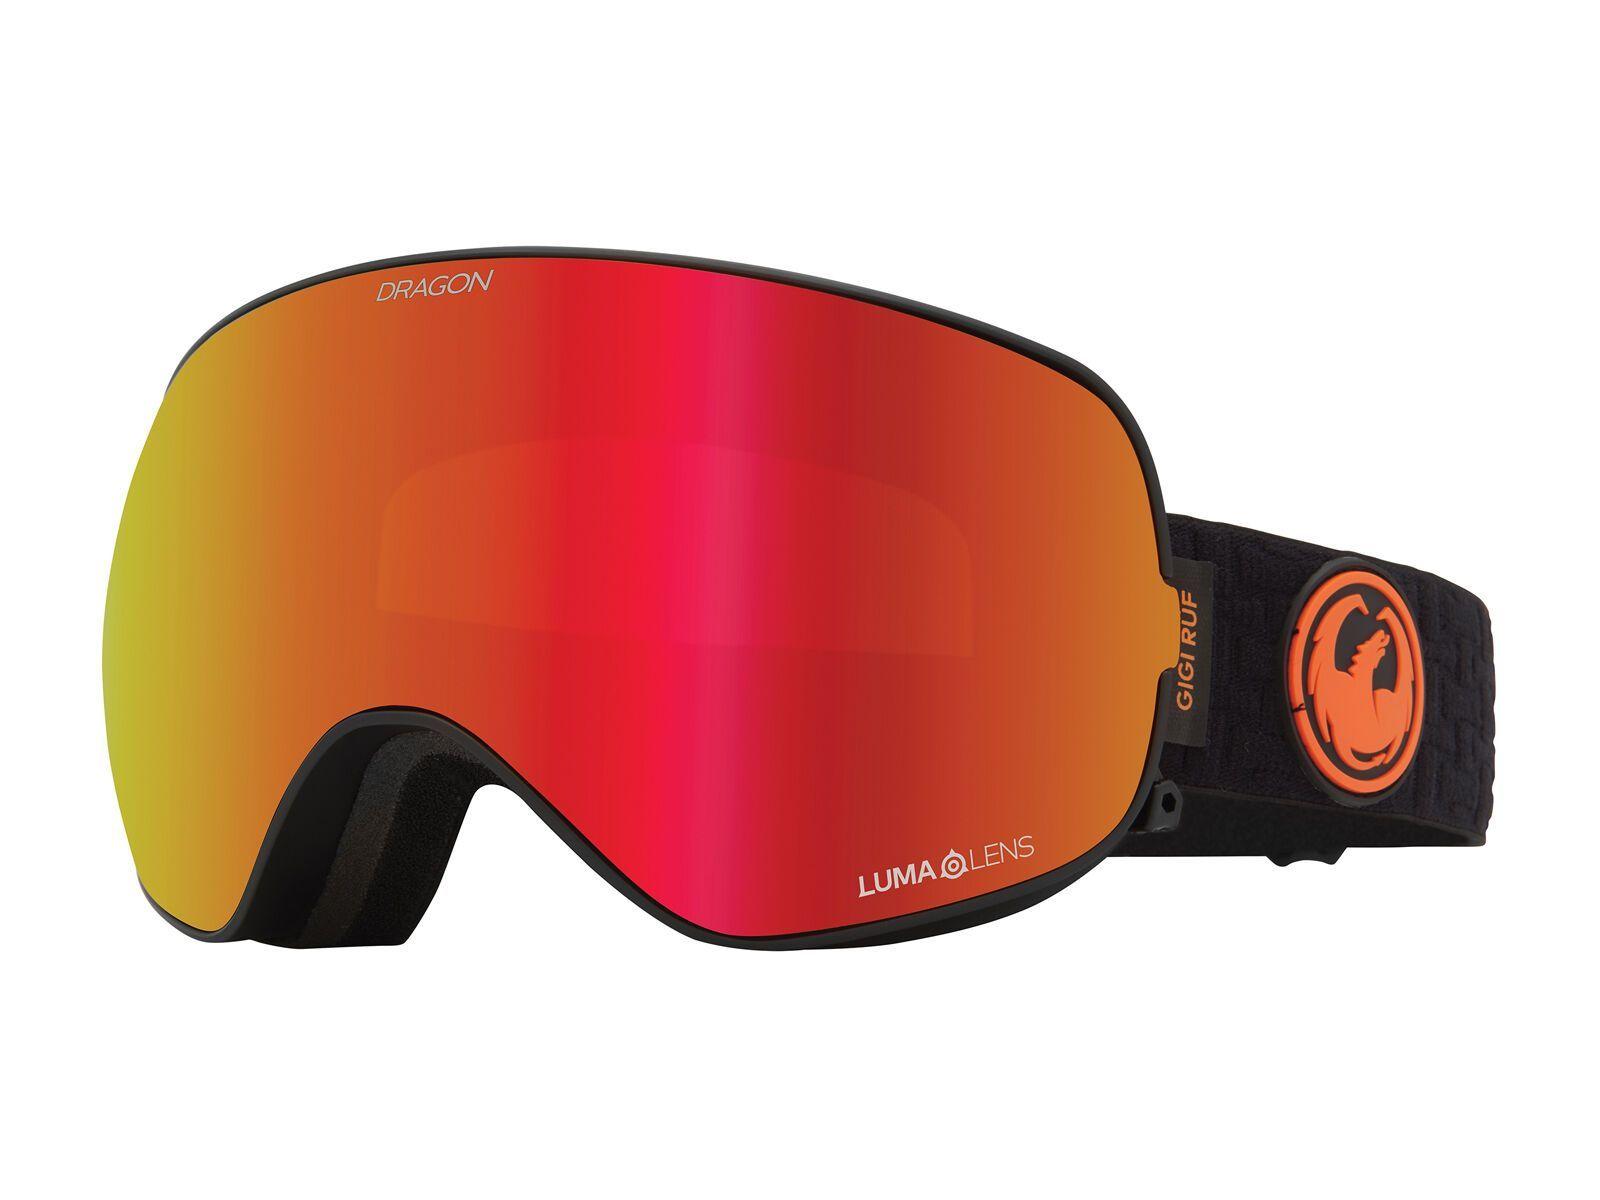 Dragon X2s inkl. WS, gigi sig 20/Lens: lumalens red ion - Skibrille 404557230608